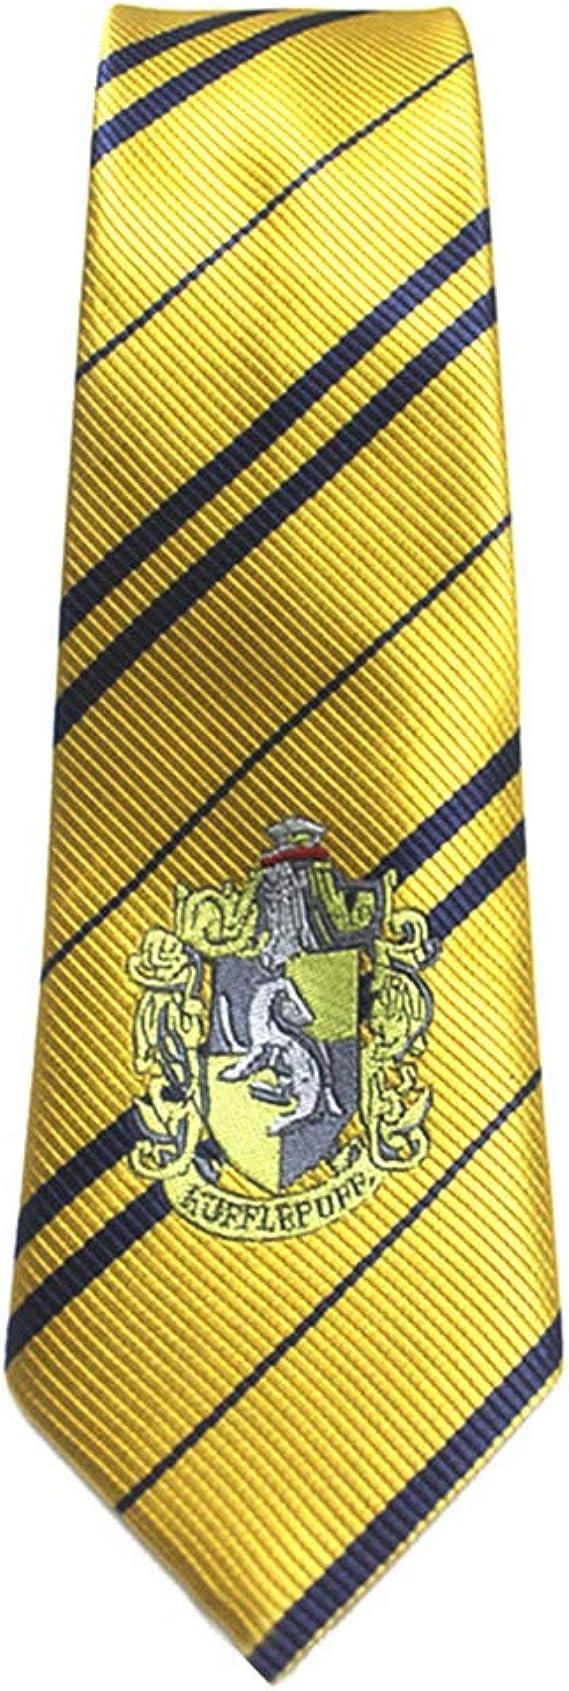 FANZHOU - Corbata de uniforme escolar oficial de Harry Potter ...